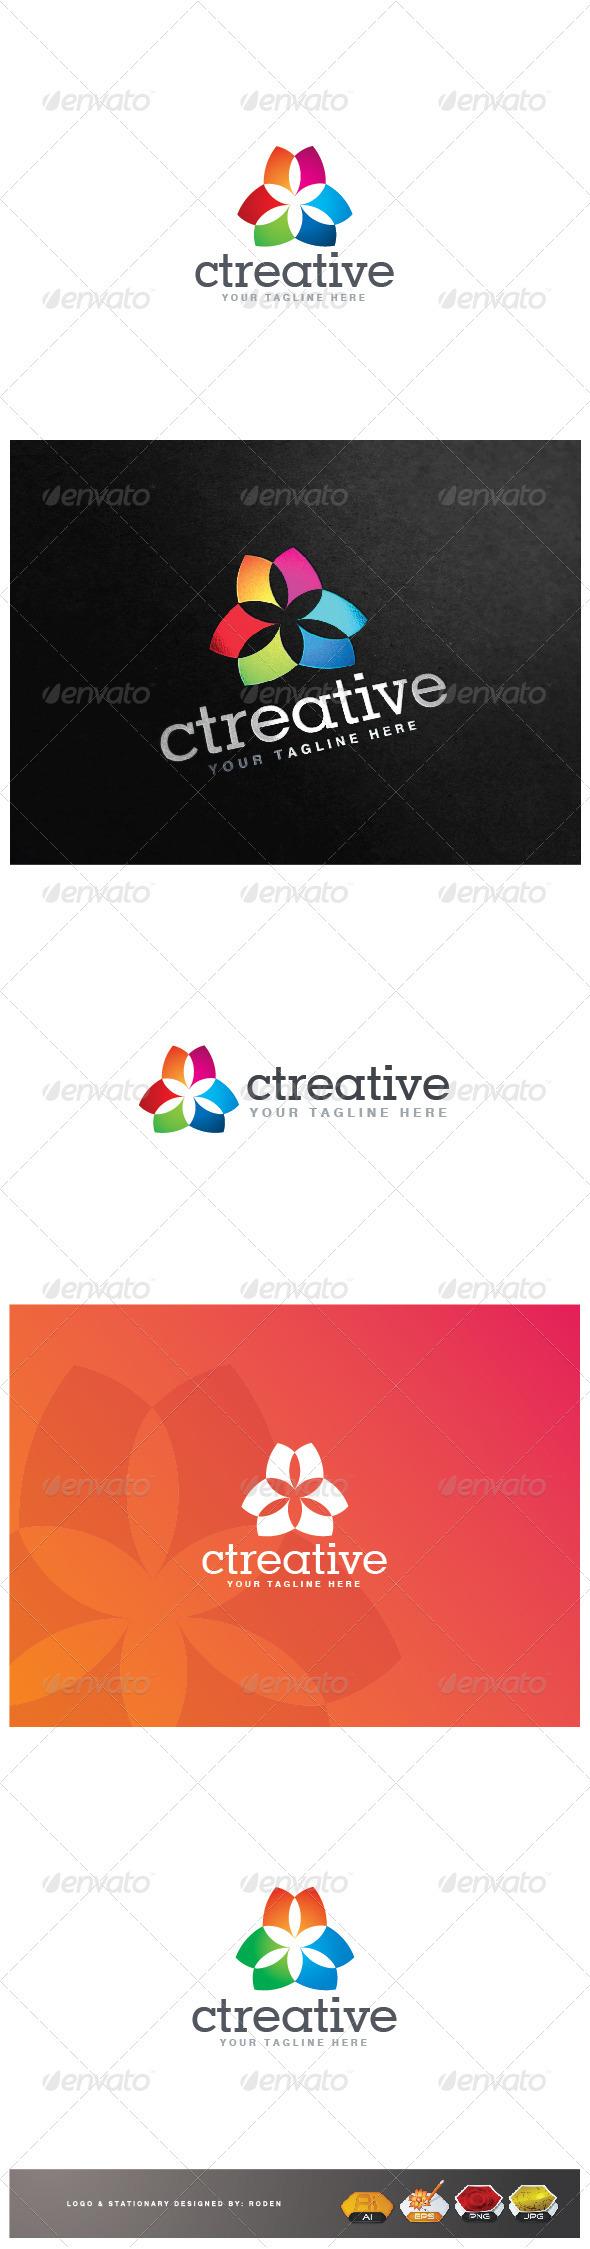 GraphicRiver Creative logo 3507705